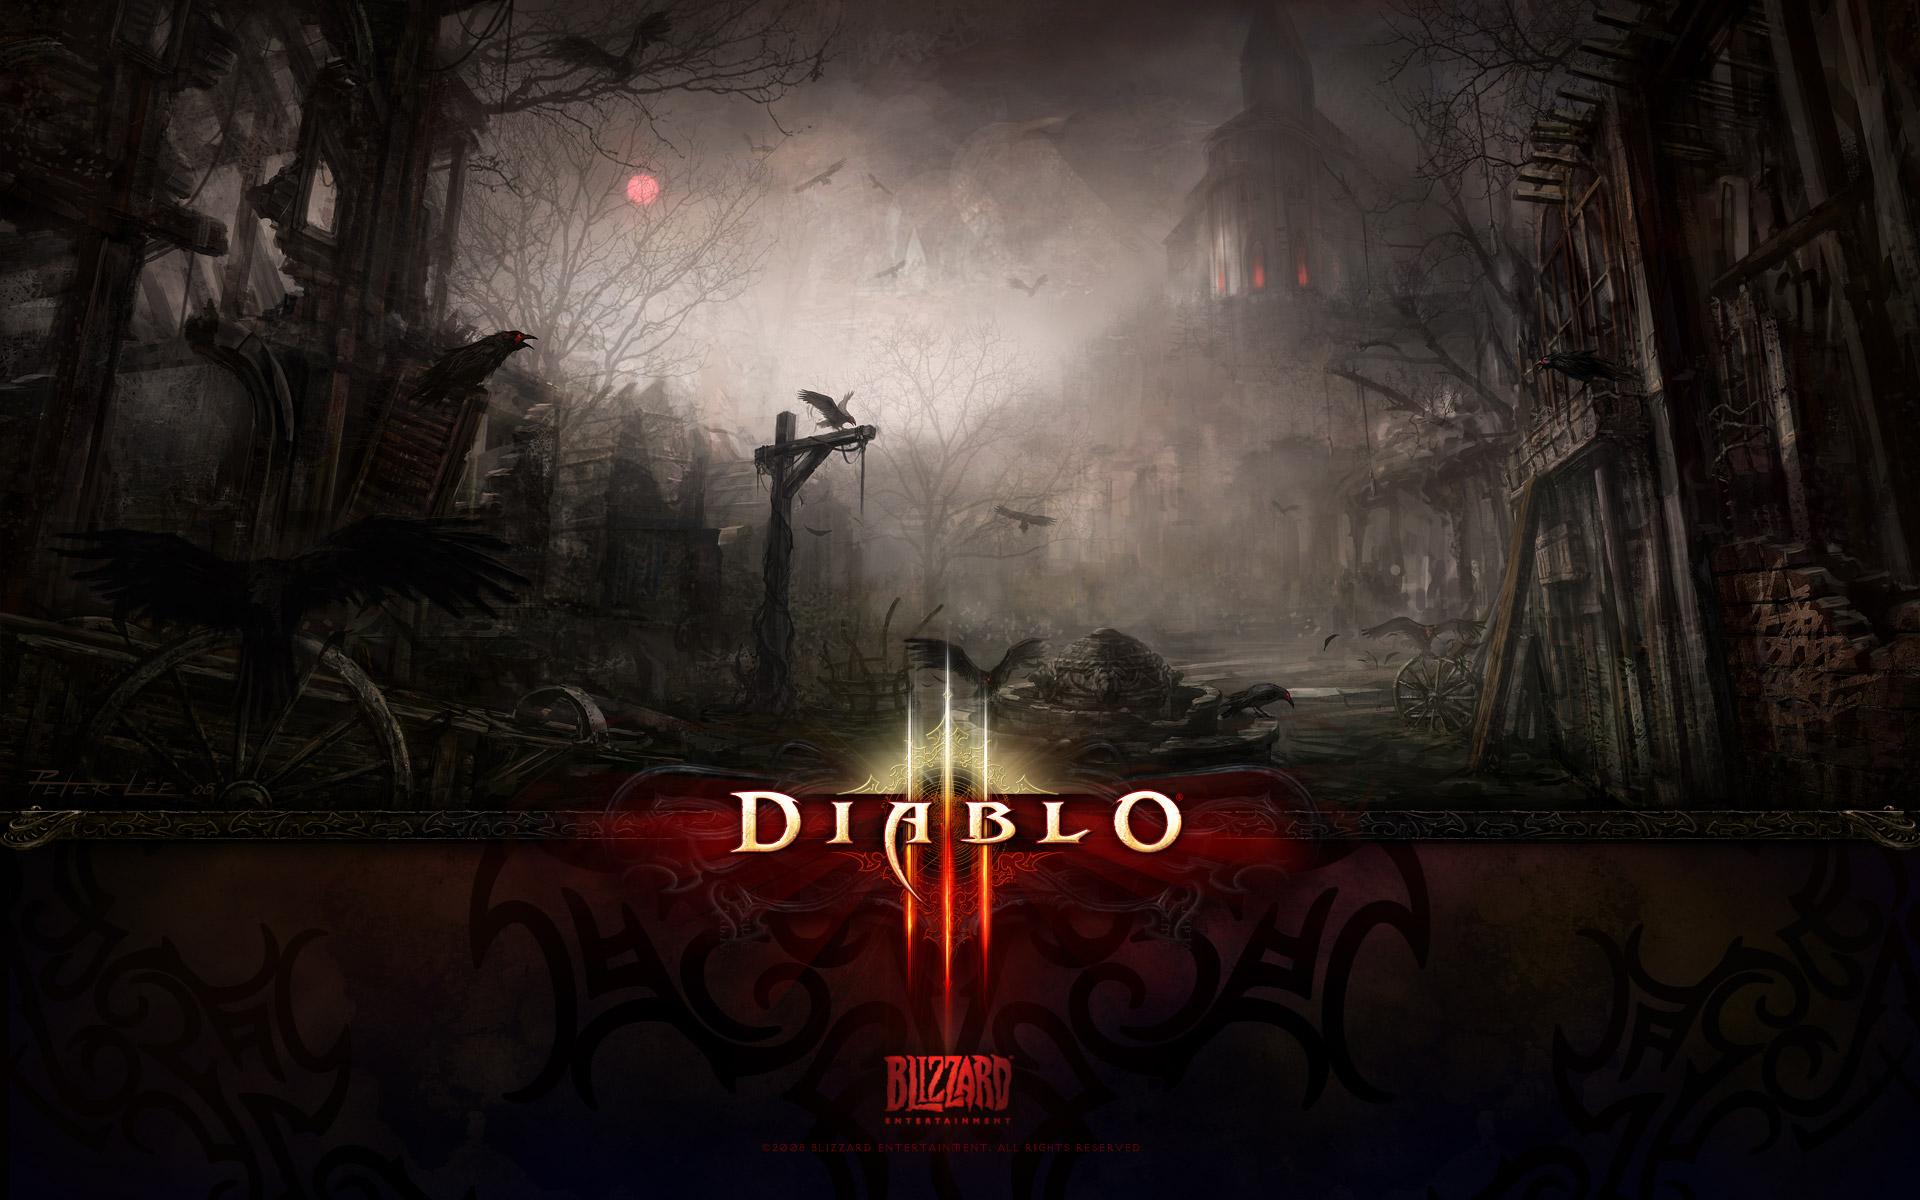 Diablo 3 wallpaper 1